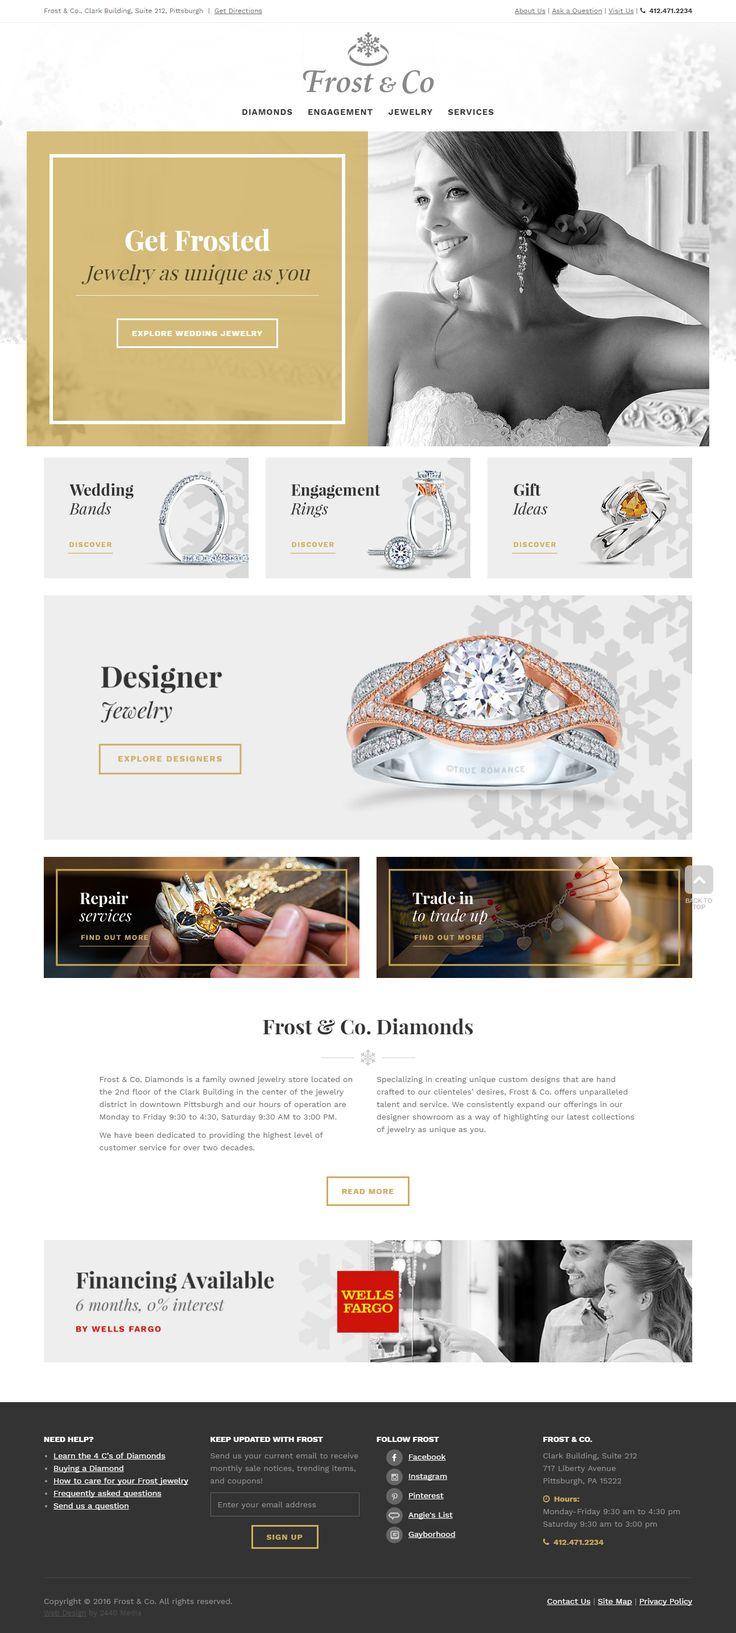 Frost Diamonds - Custom Website Design http://www.frostdiamonds.com/